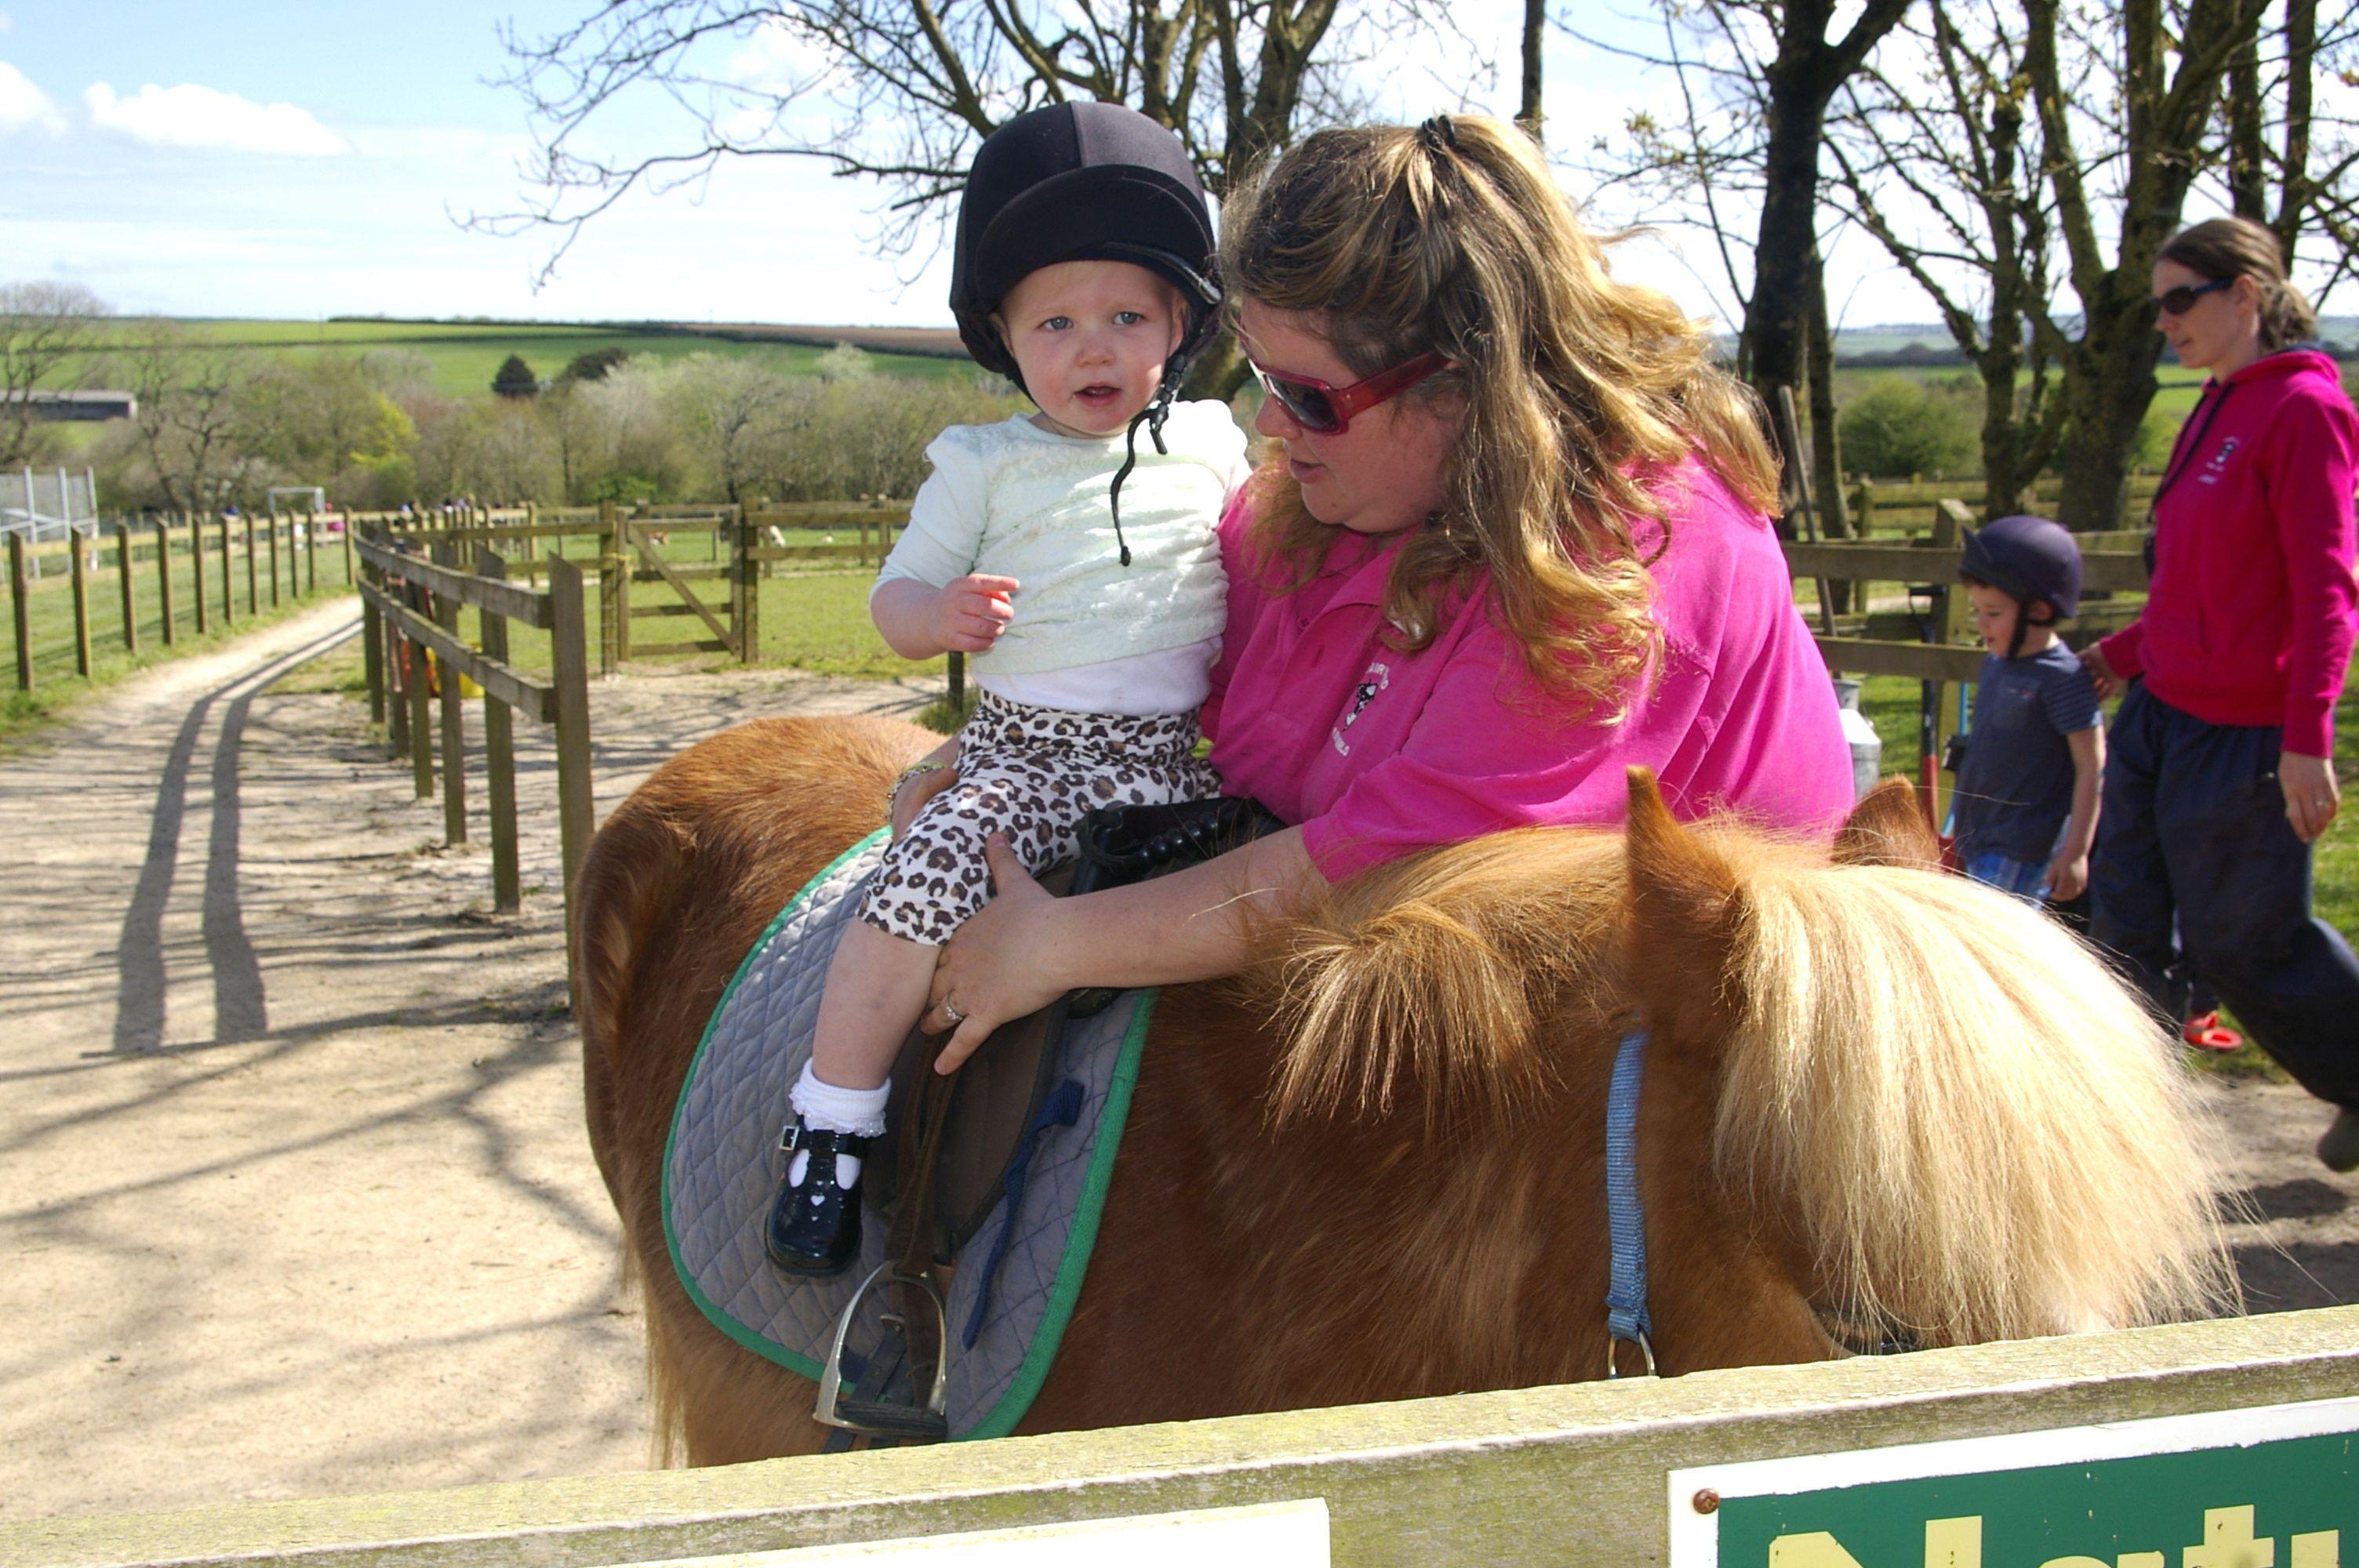 Sienna's first pony ride! #parkdean #britishholiday #whiteacres #dairyland